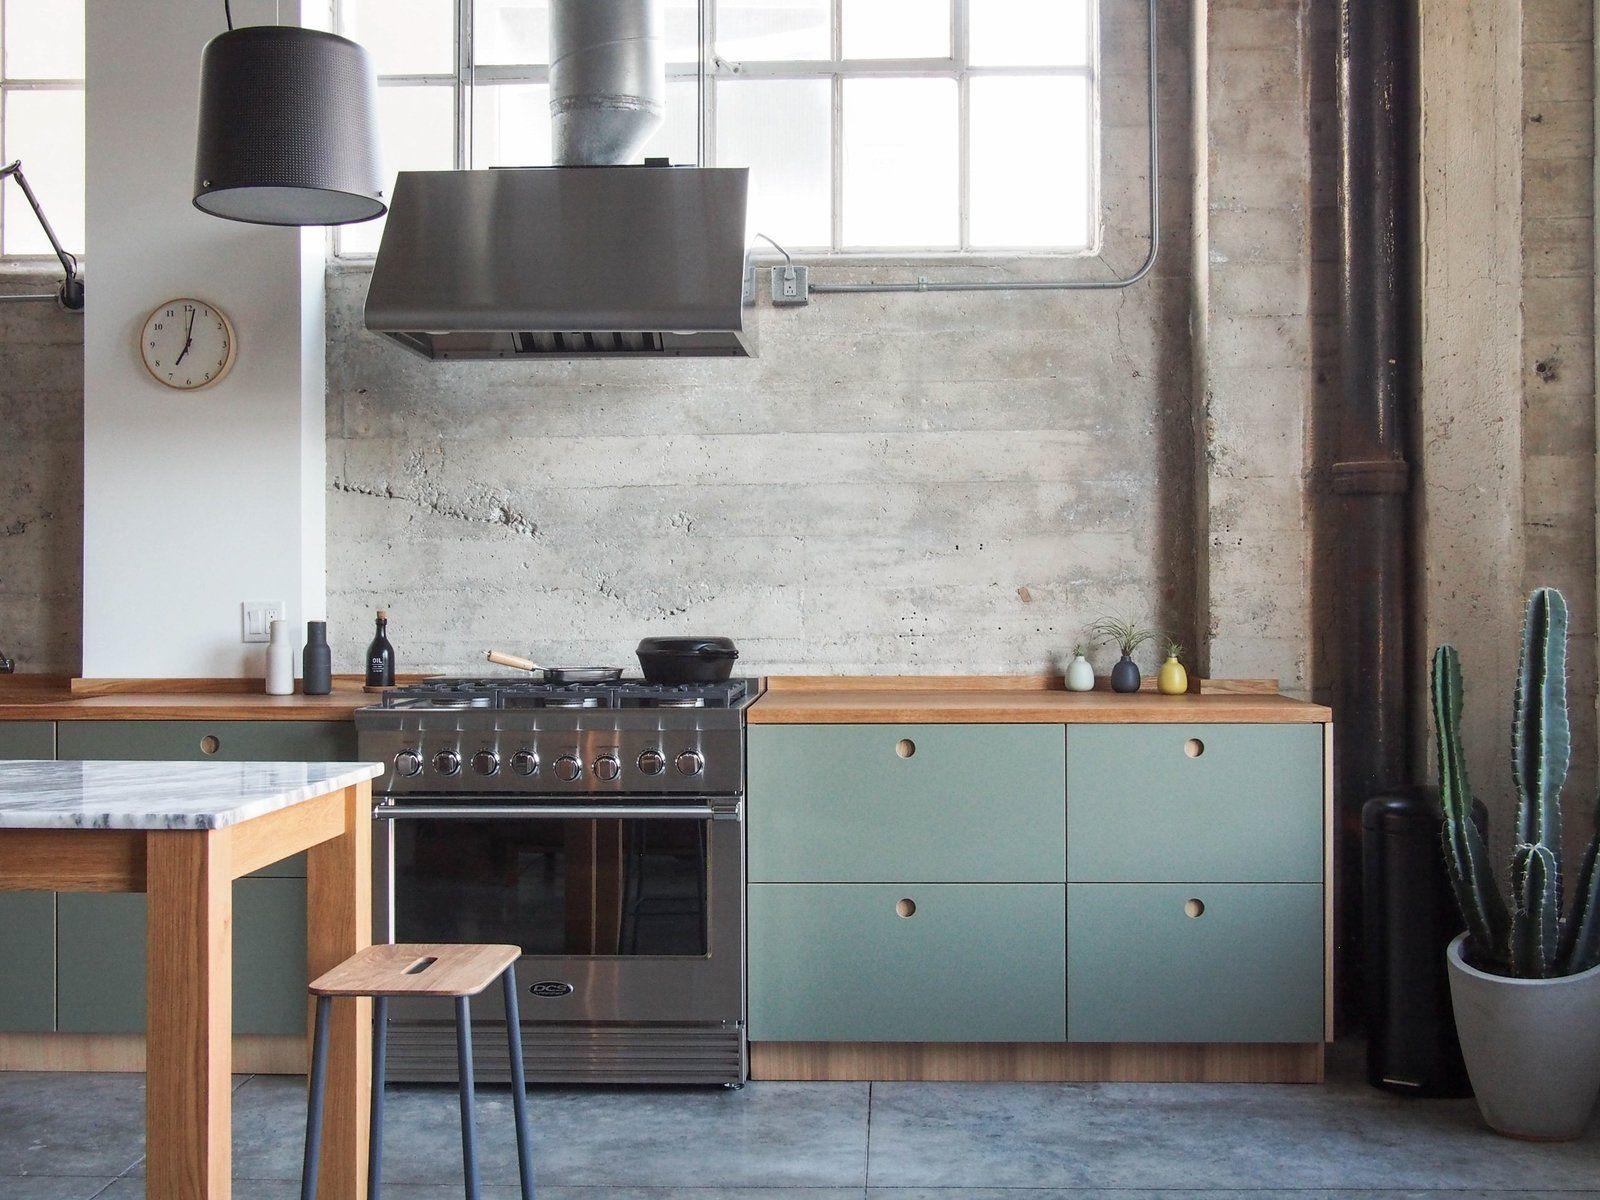 modern kitchen upgrade ideas from a danish design firm